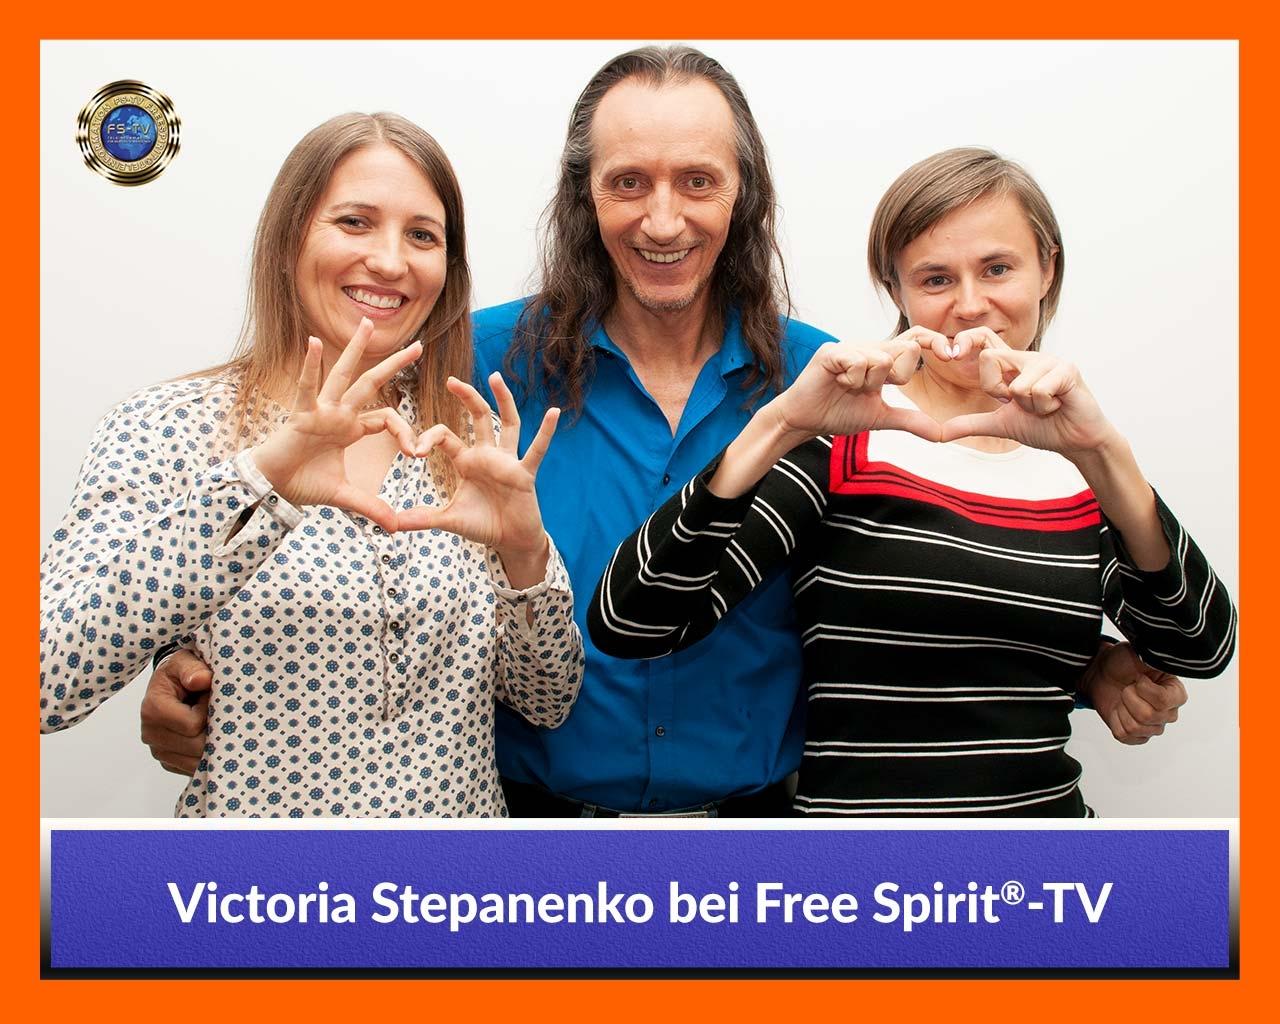 Galleriebild-Victoria-Stepanenko-07